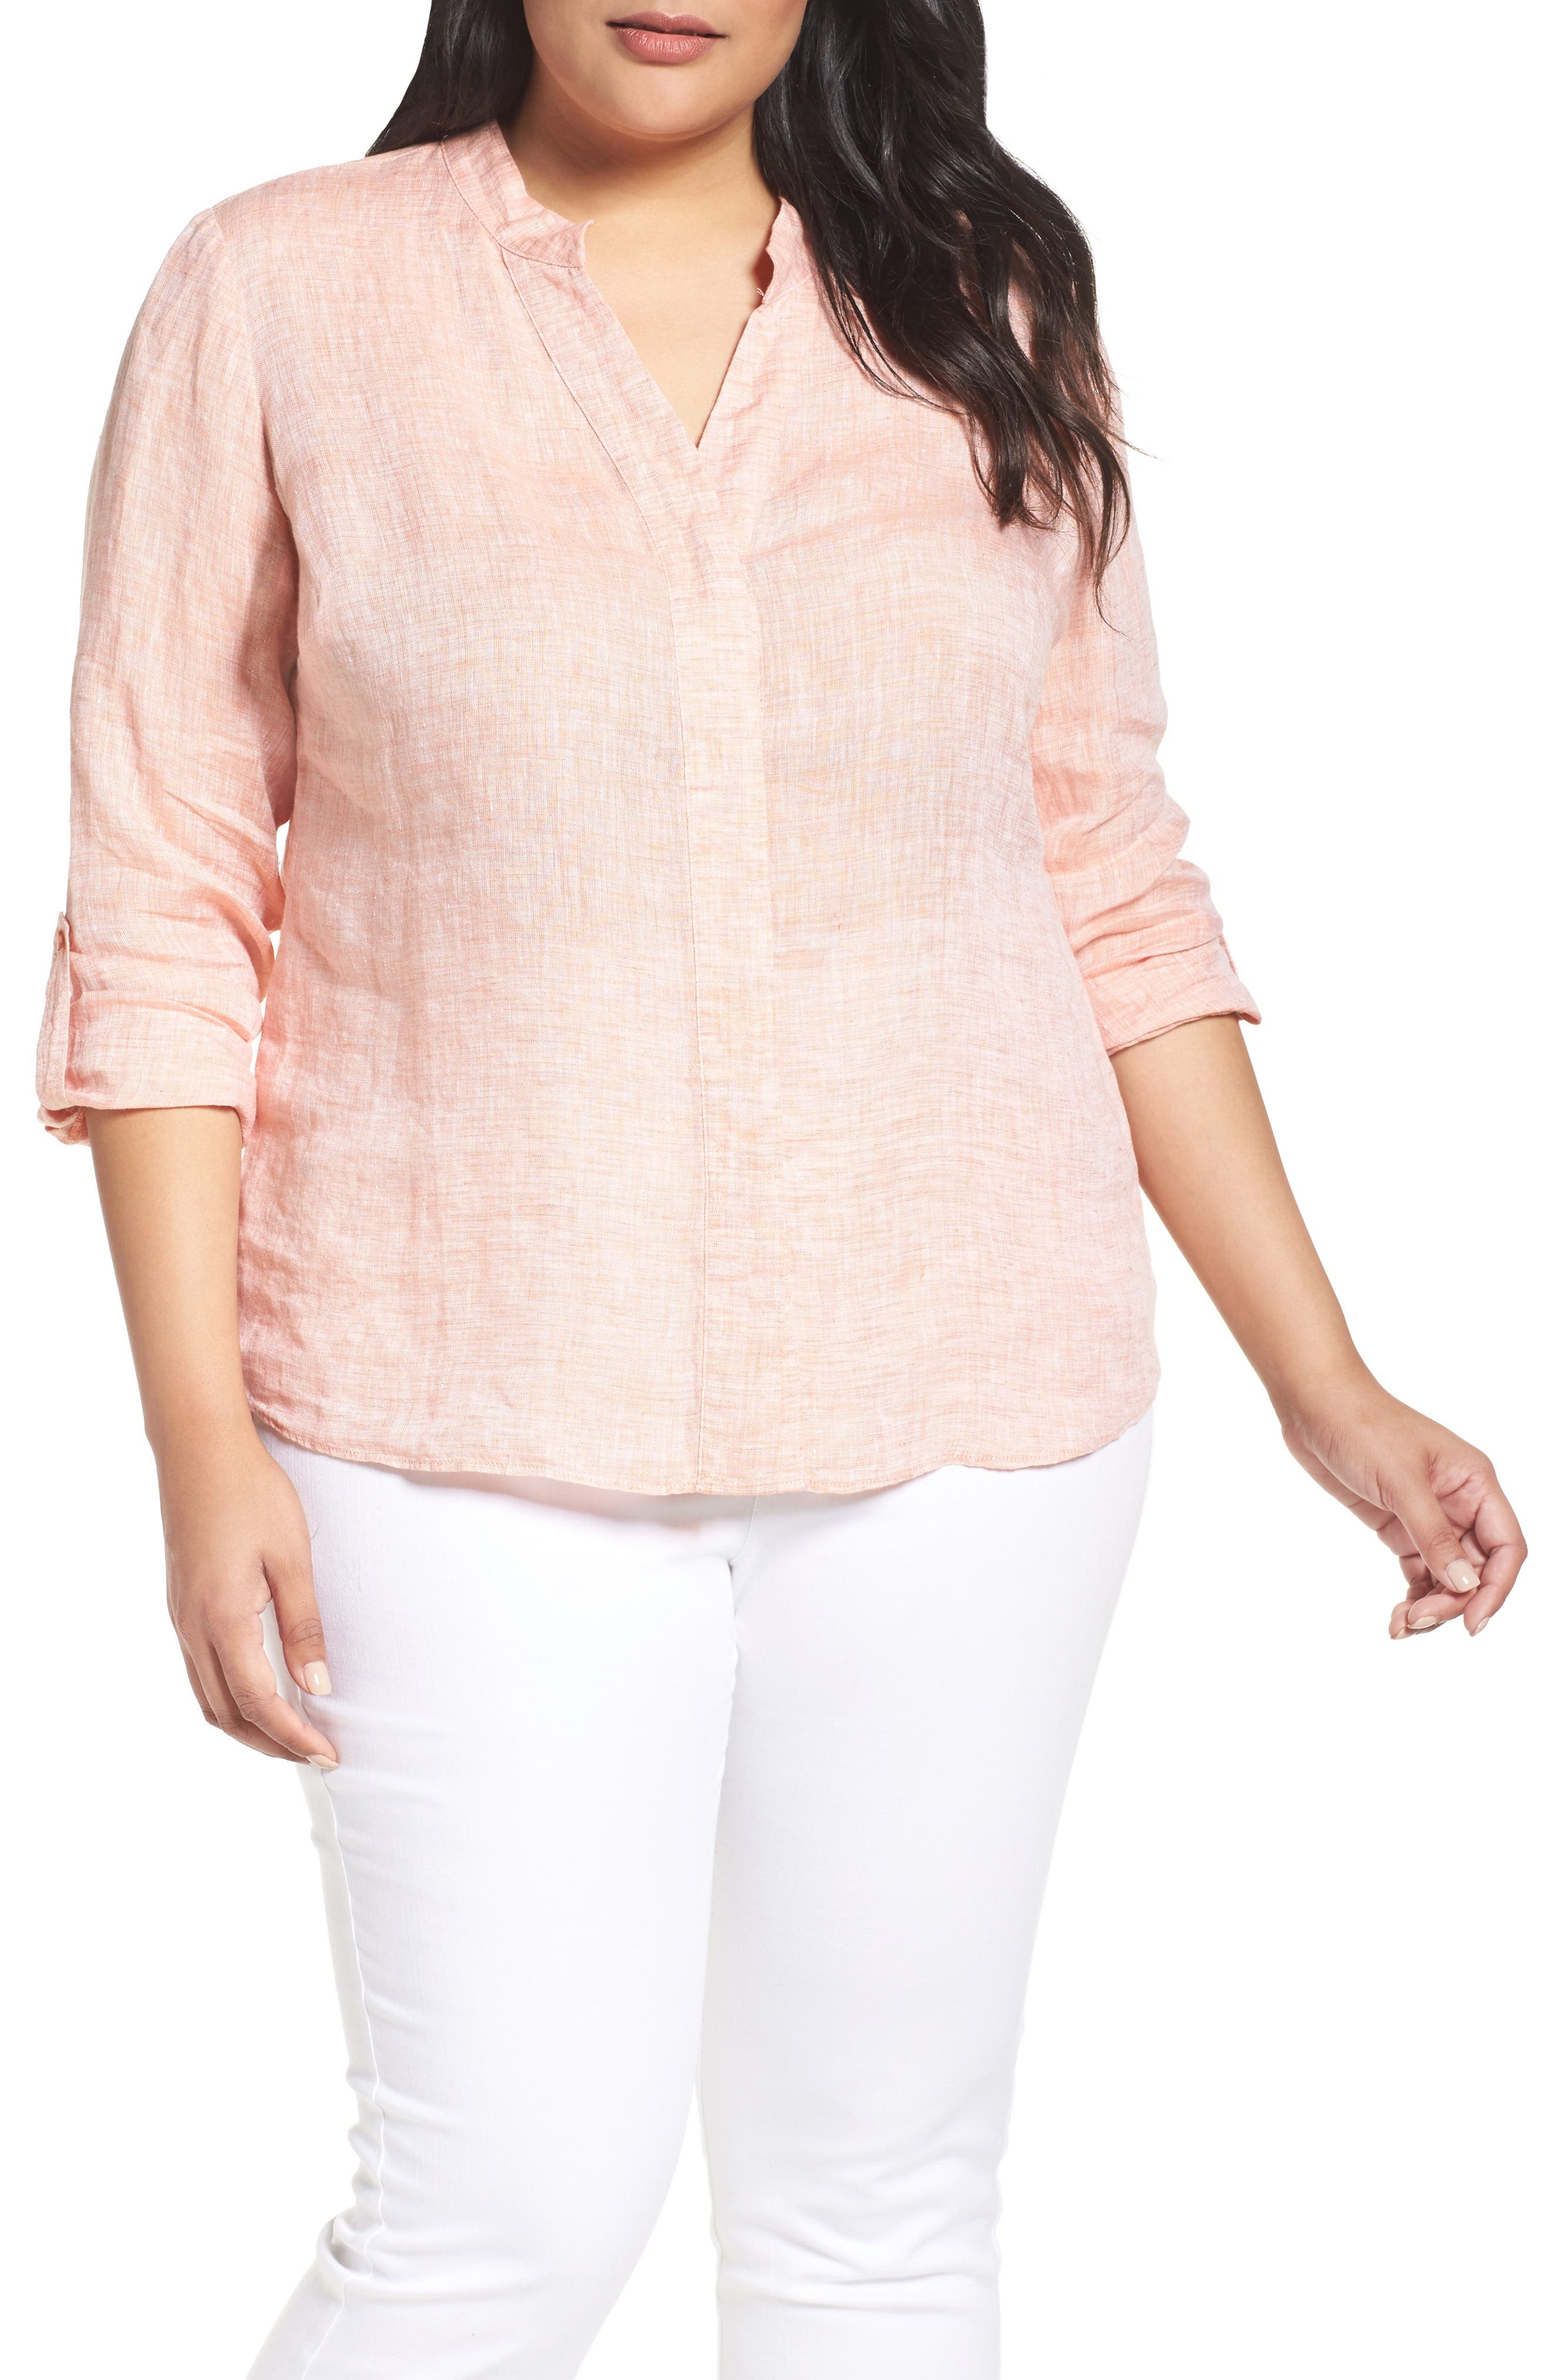 Alternate Image 1 Selected - NIC+ZOE Drifty Woven Linen Shirt (Plus Size)